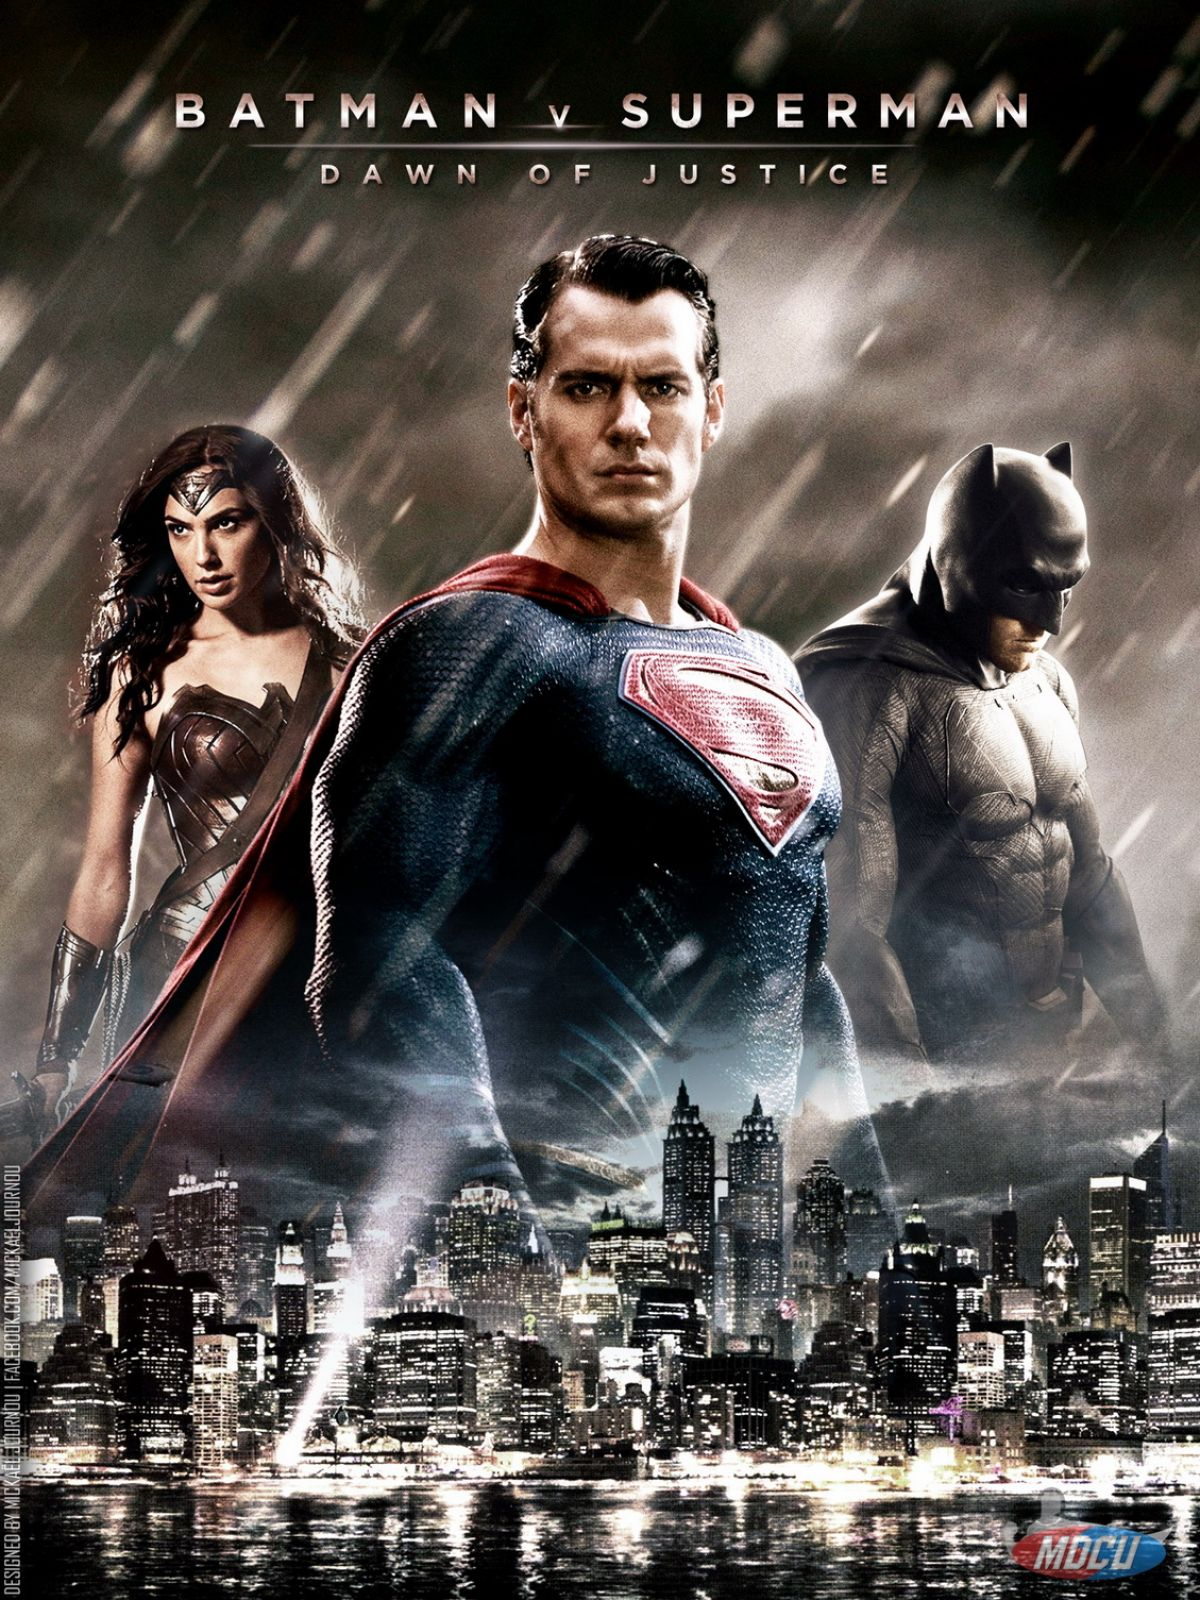 Superman vs batman 2017 movie poster